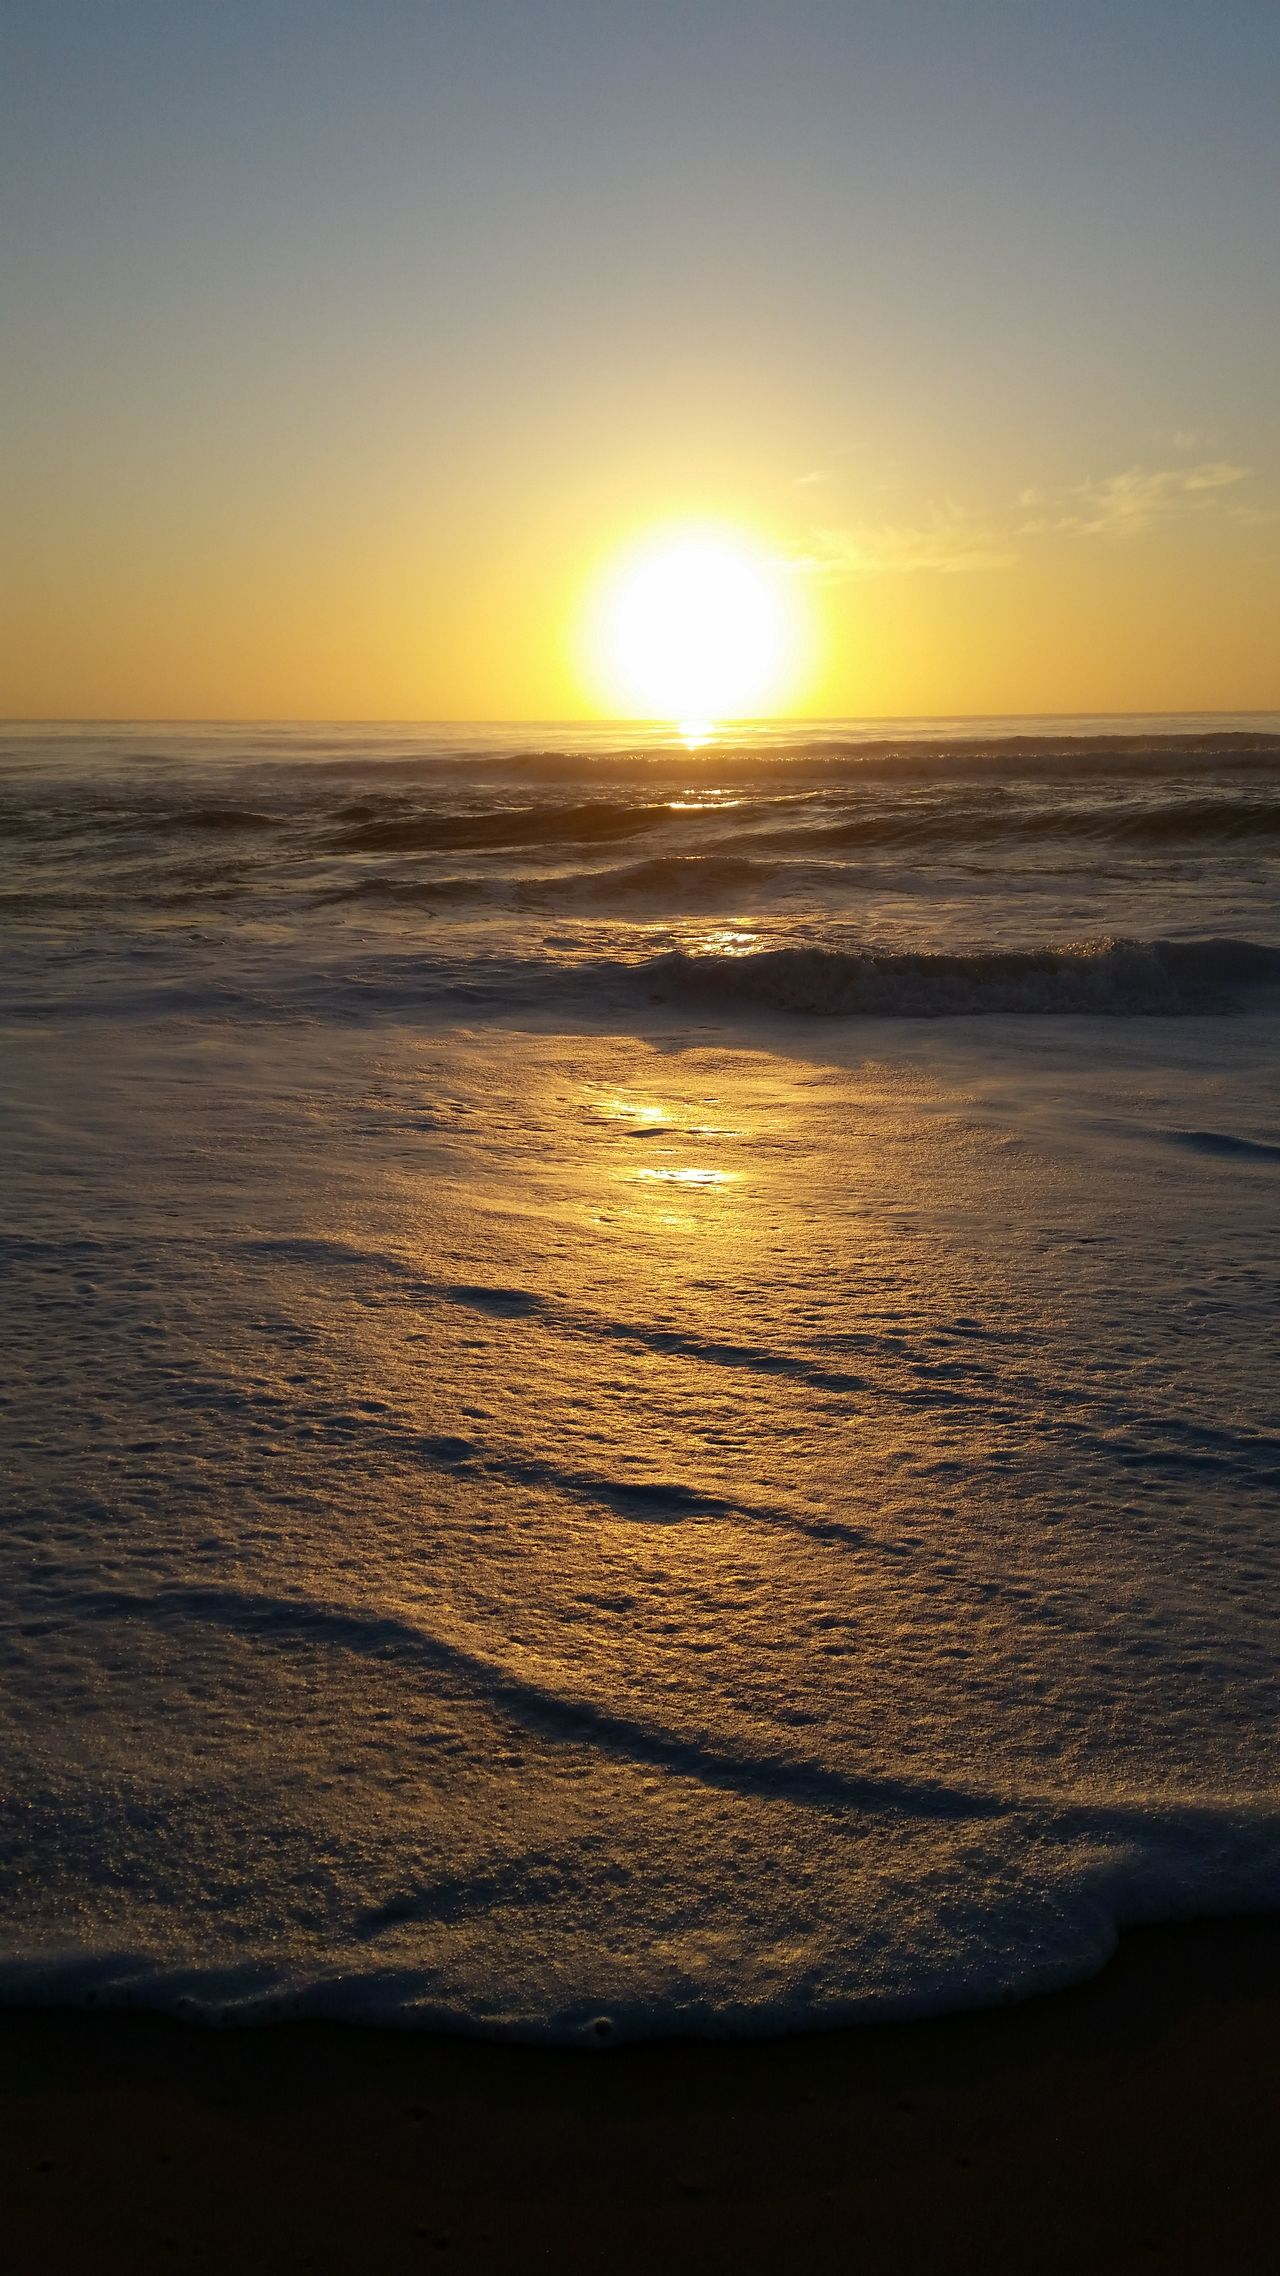 Waves, Ocean, Nature Goodmorningfrommylittlepartoftheworld EyeEmBestPics Summer 2016 Showcase: January Capture The Moment EyeEm Best Pics Nordic Light Ladyphotographerofthemonth Fragility Orange Color White Wash Canonphotography